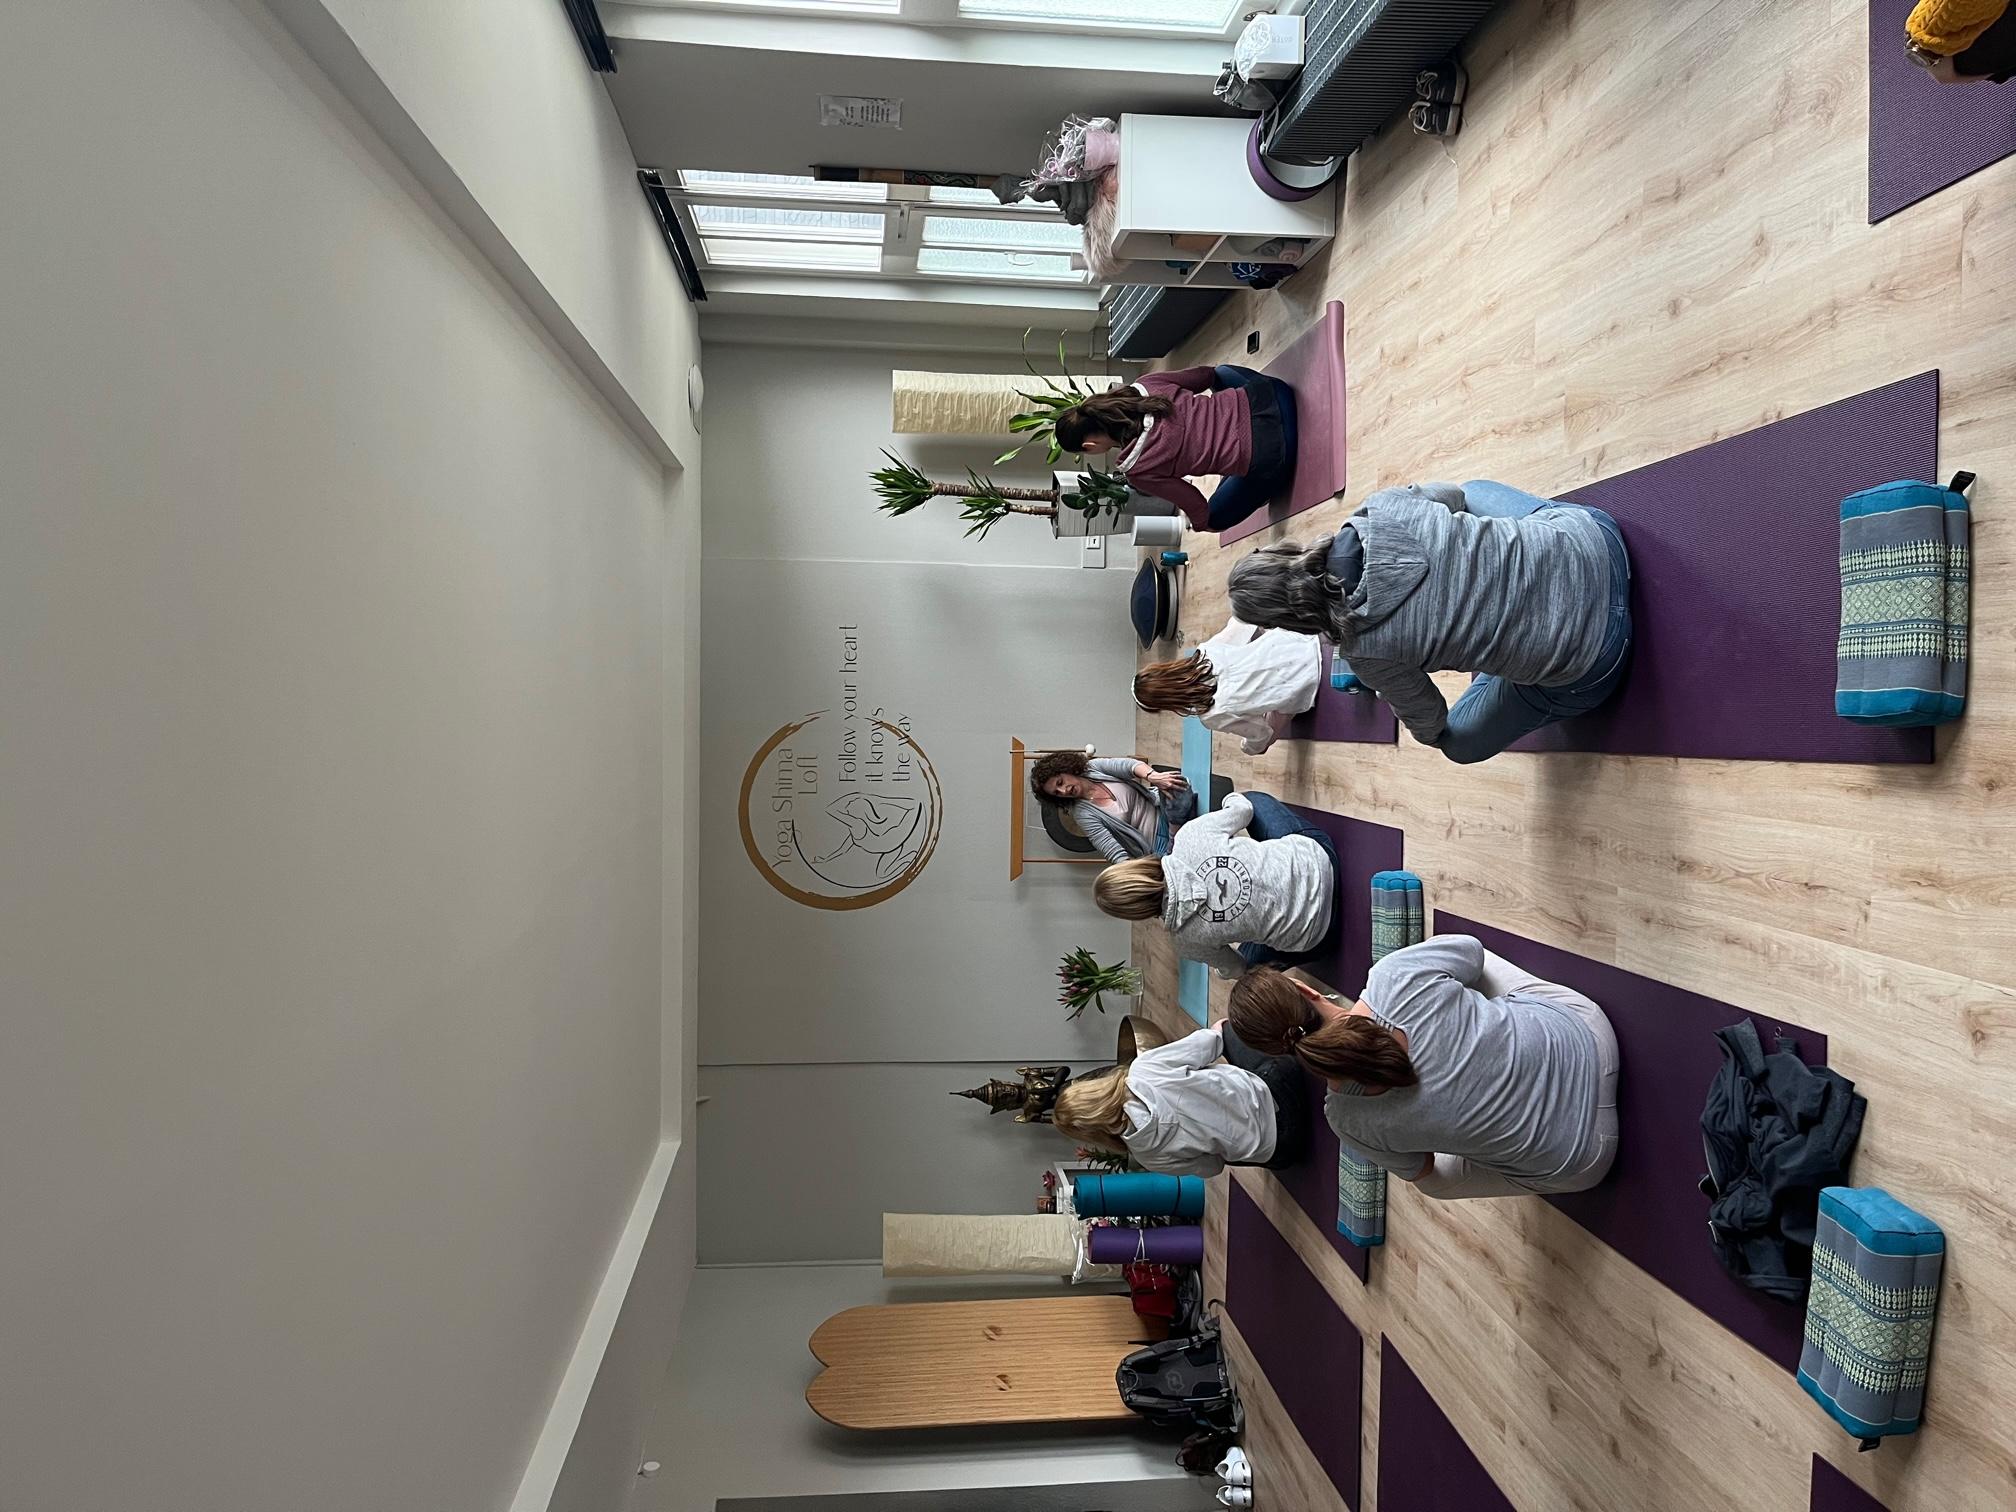 Yoga Fitness Level I Sandra Golob Yoga Shima Yoga In Remscheid Yoga In Remscheid Yogakurse Yoga Bergisches Land